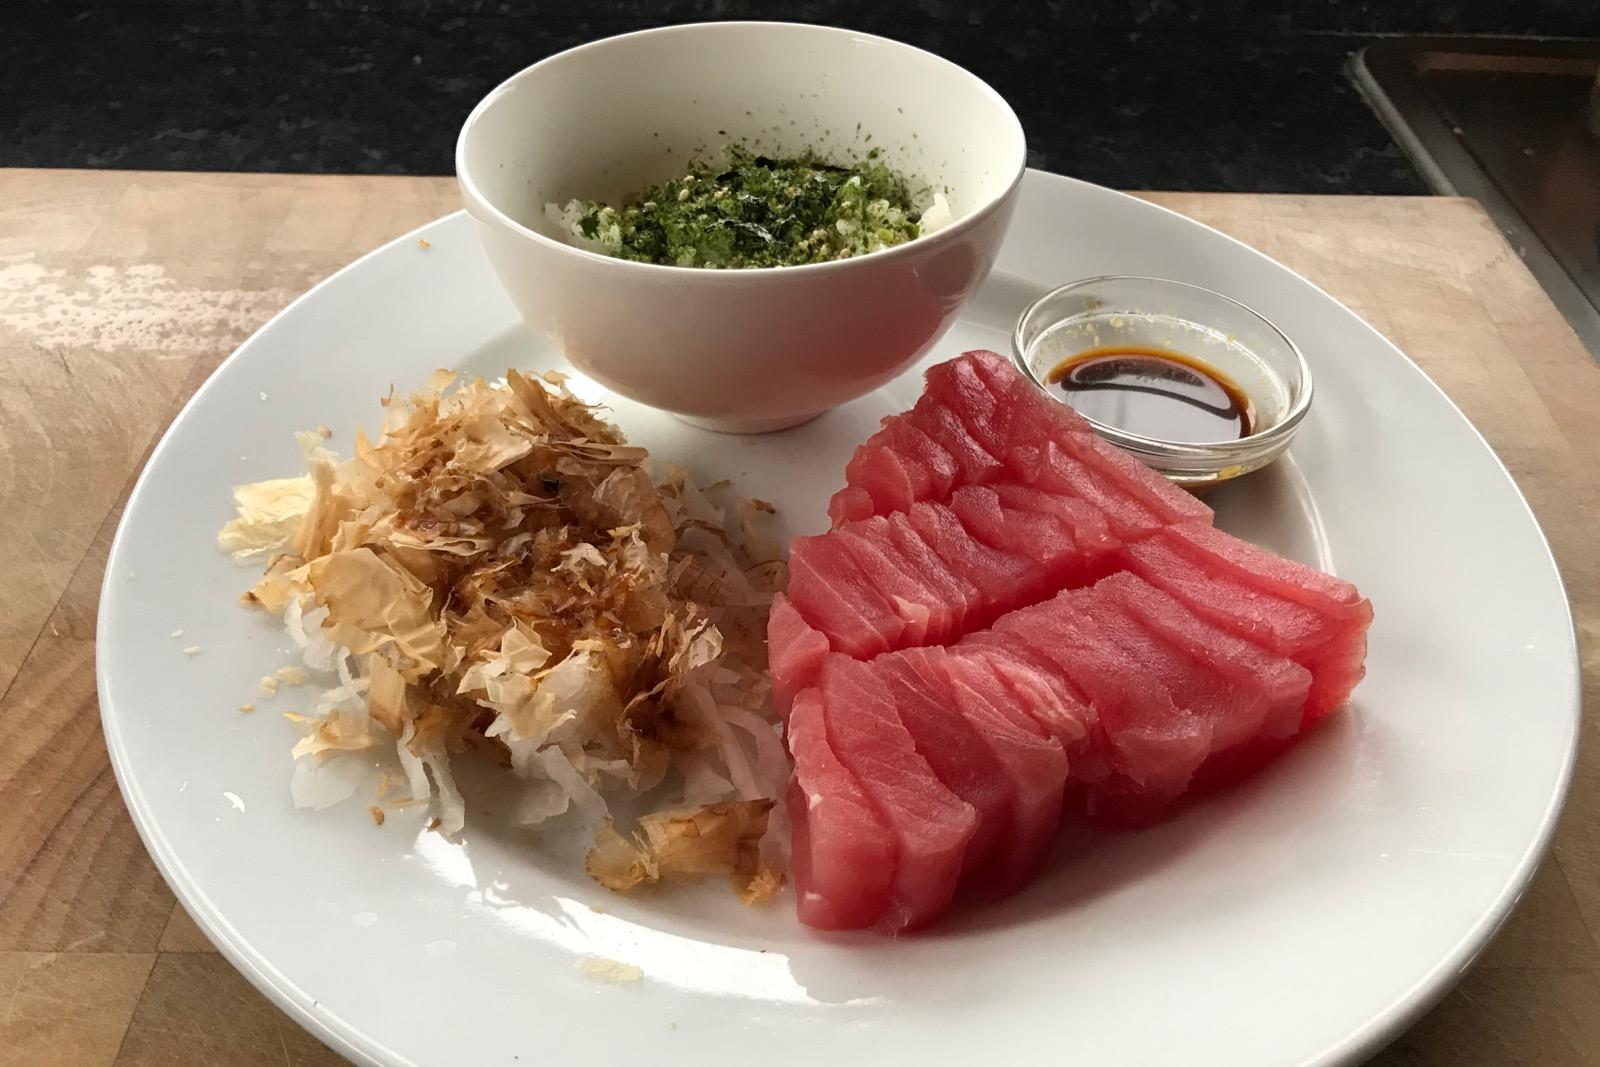 http://blog.rickk.com/food/2019/02/03/ate.2019.02.02.d.jpg